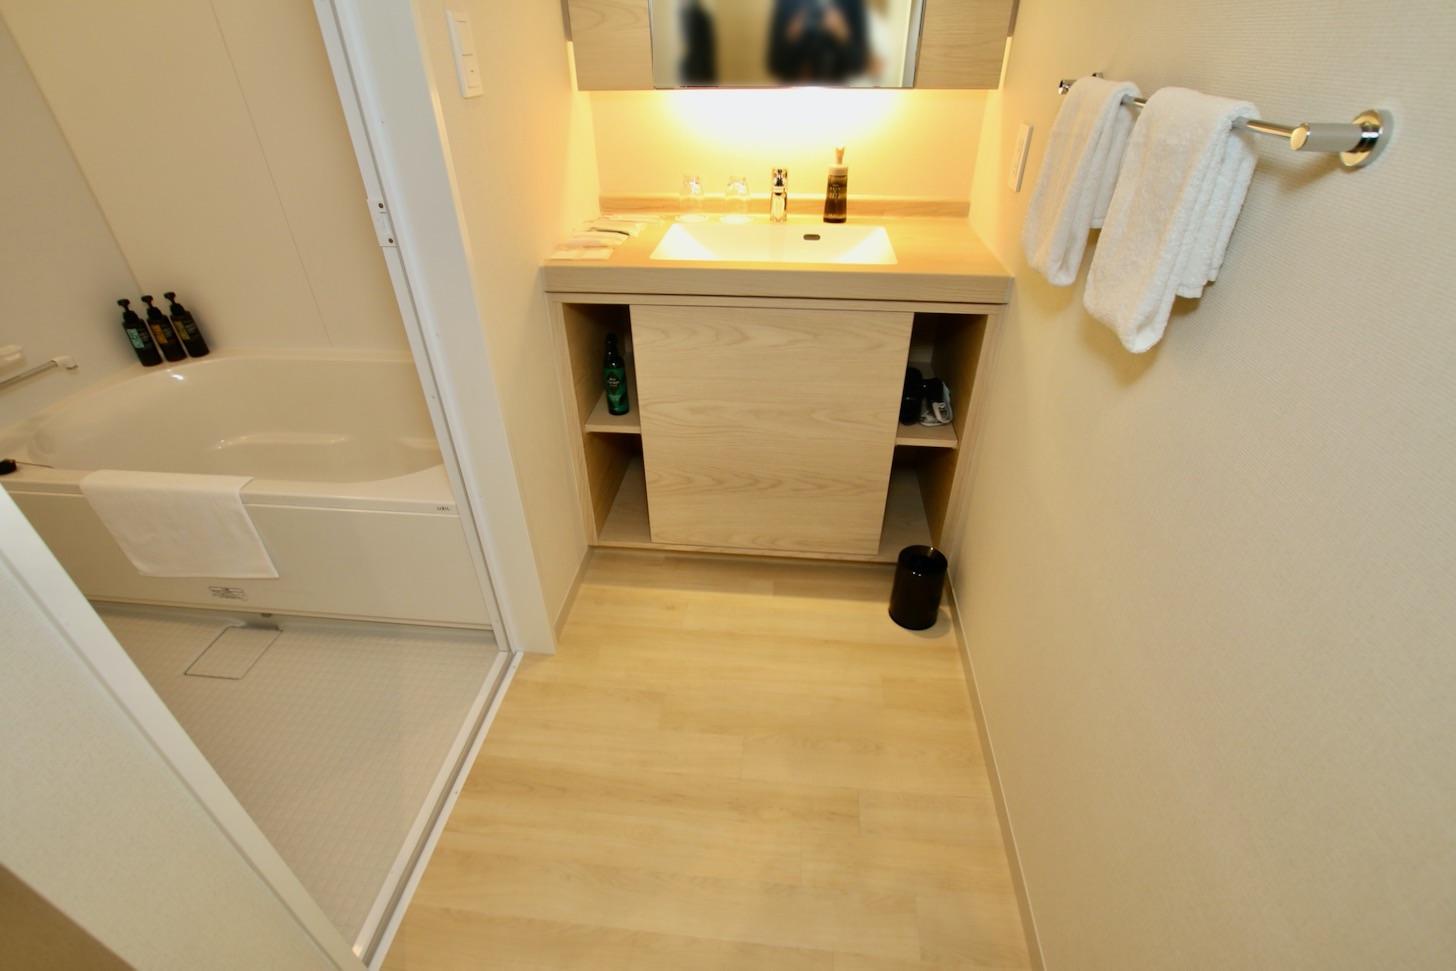 LINK FOREST ツインルーム(広さ31㎡/10室)洗面台とバスルーム